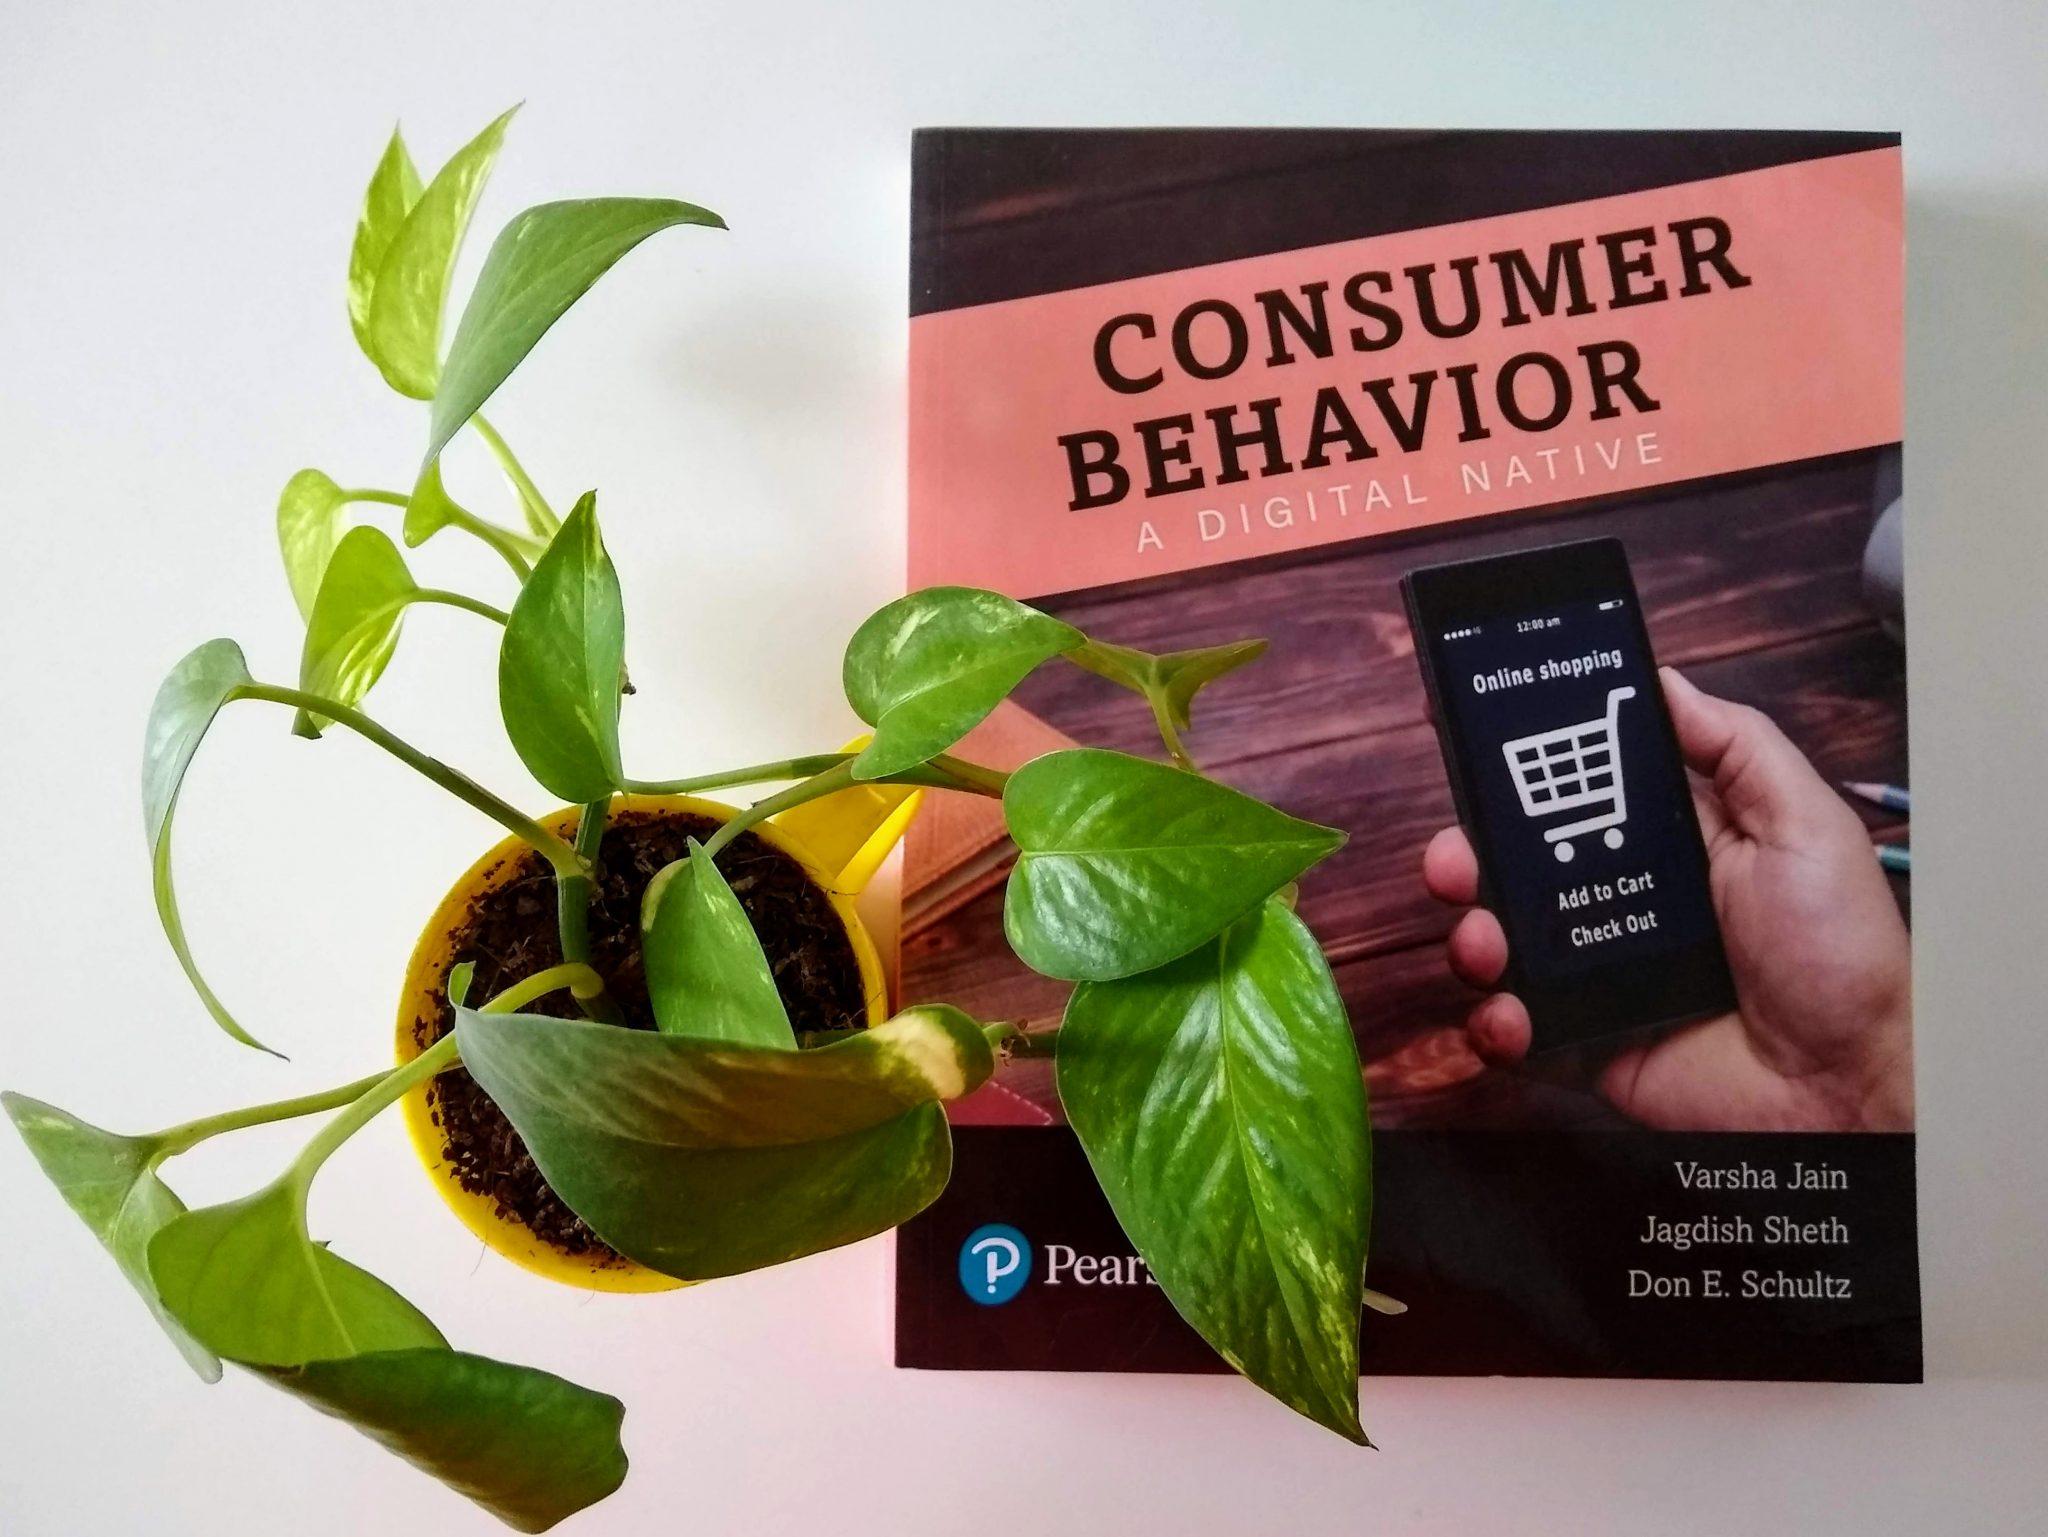 consumer behaviour digital native